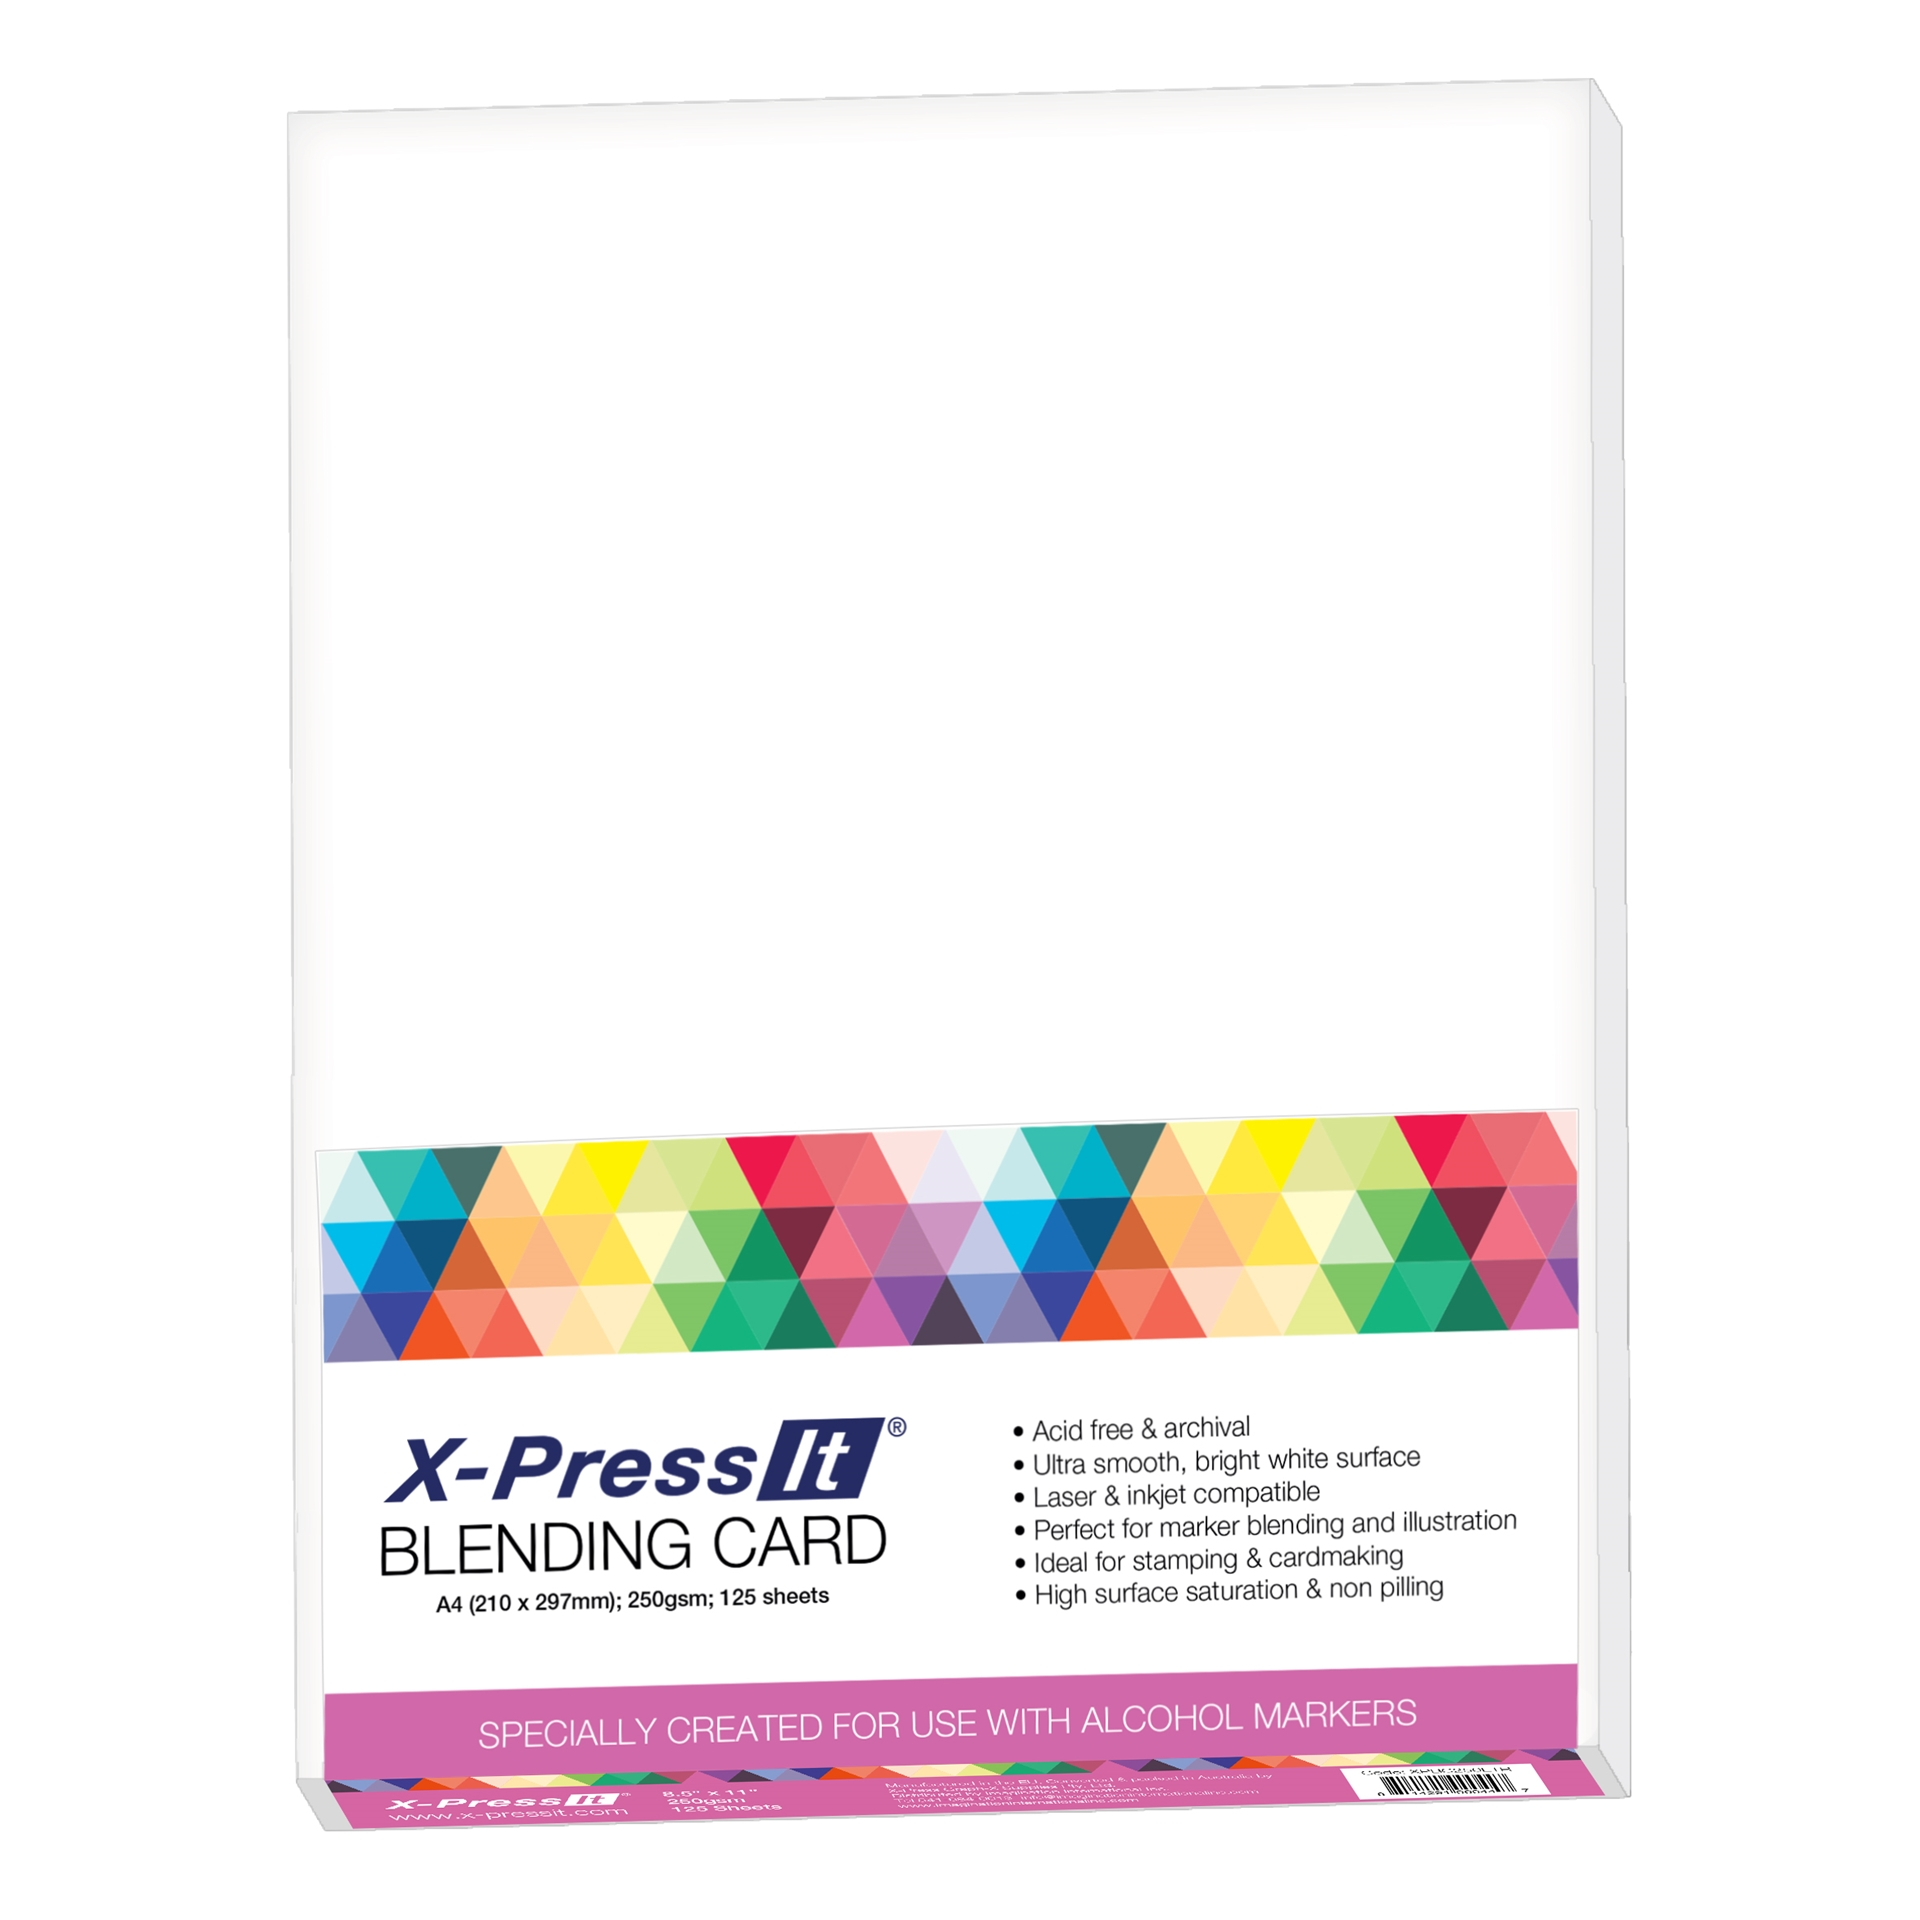 0033480_x-press-it-blending-card-mini-125pk